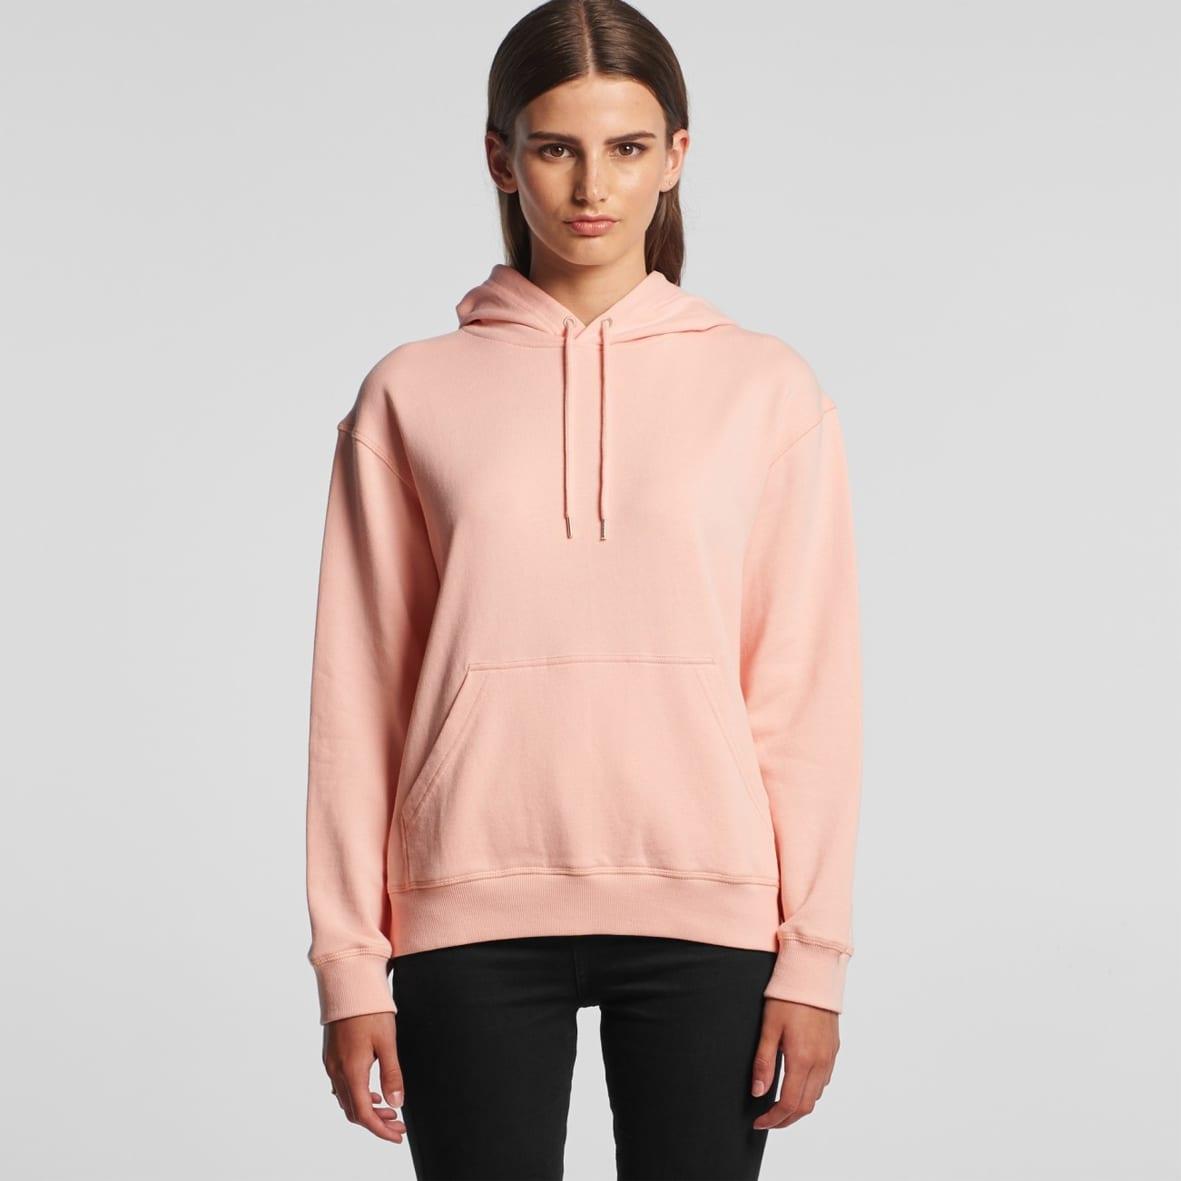 AS 4120 Women's Premium Hood